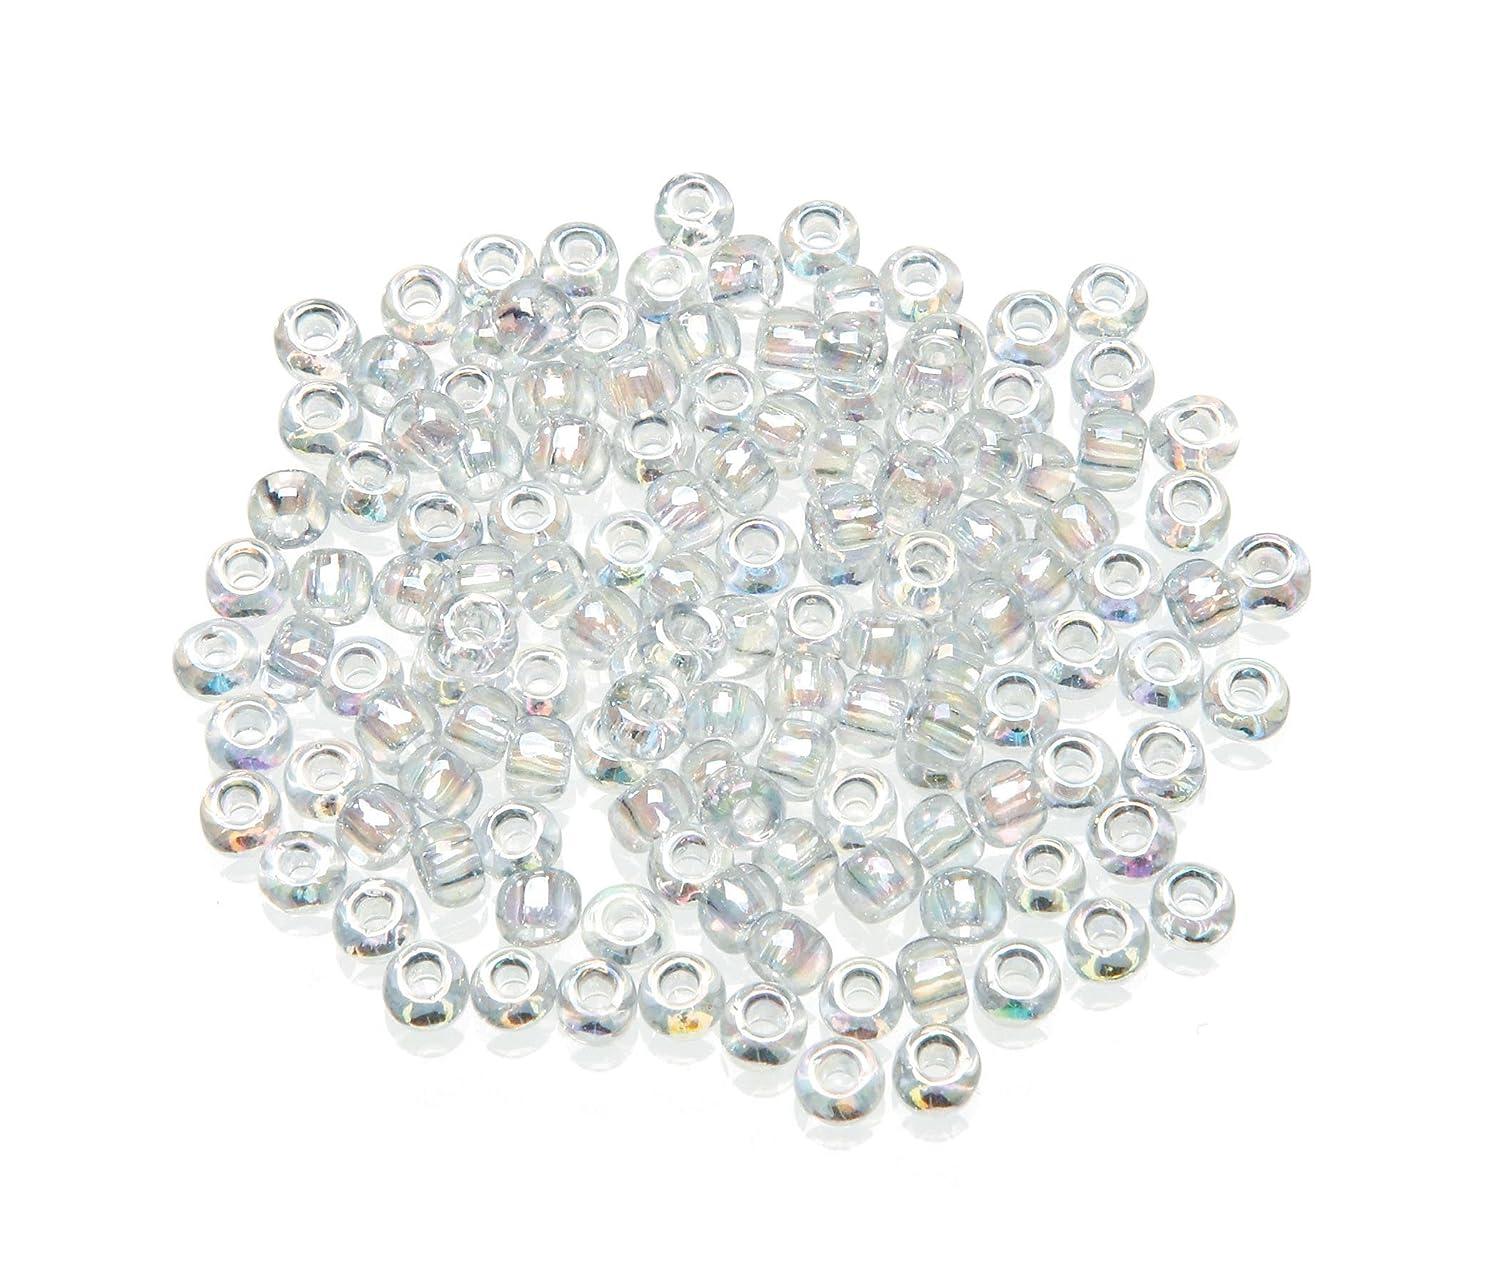 Darice Toho Japanese Glass Seed Beads, Transparent Rainbow Clear